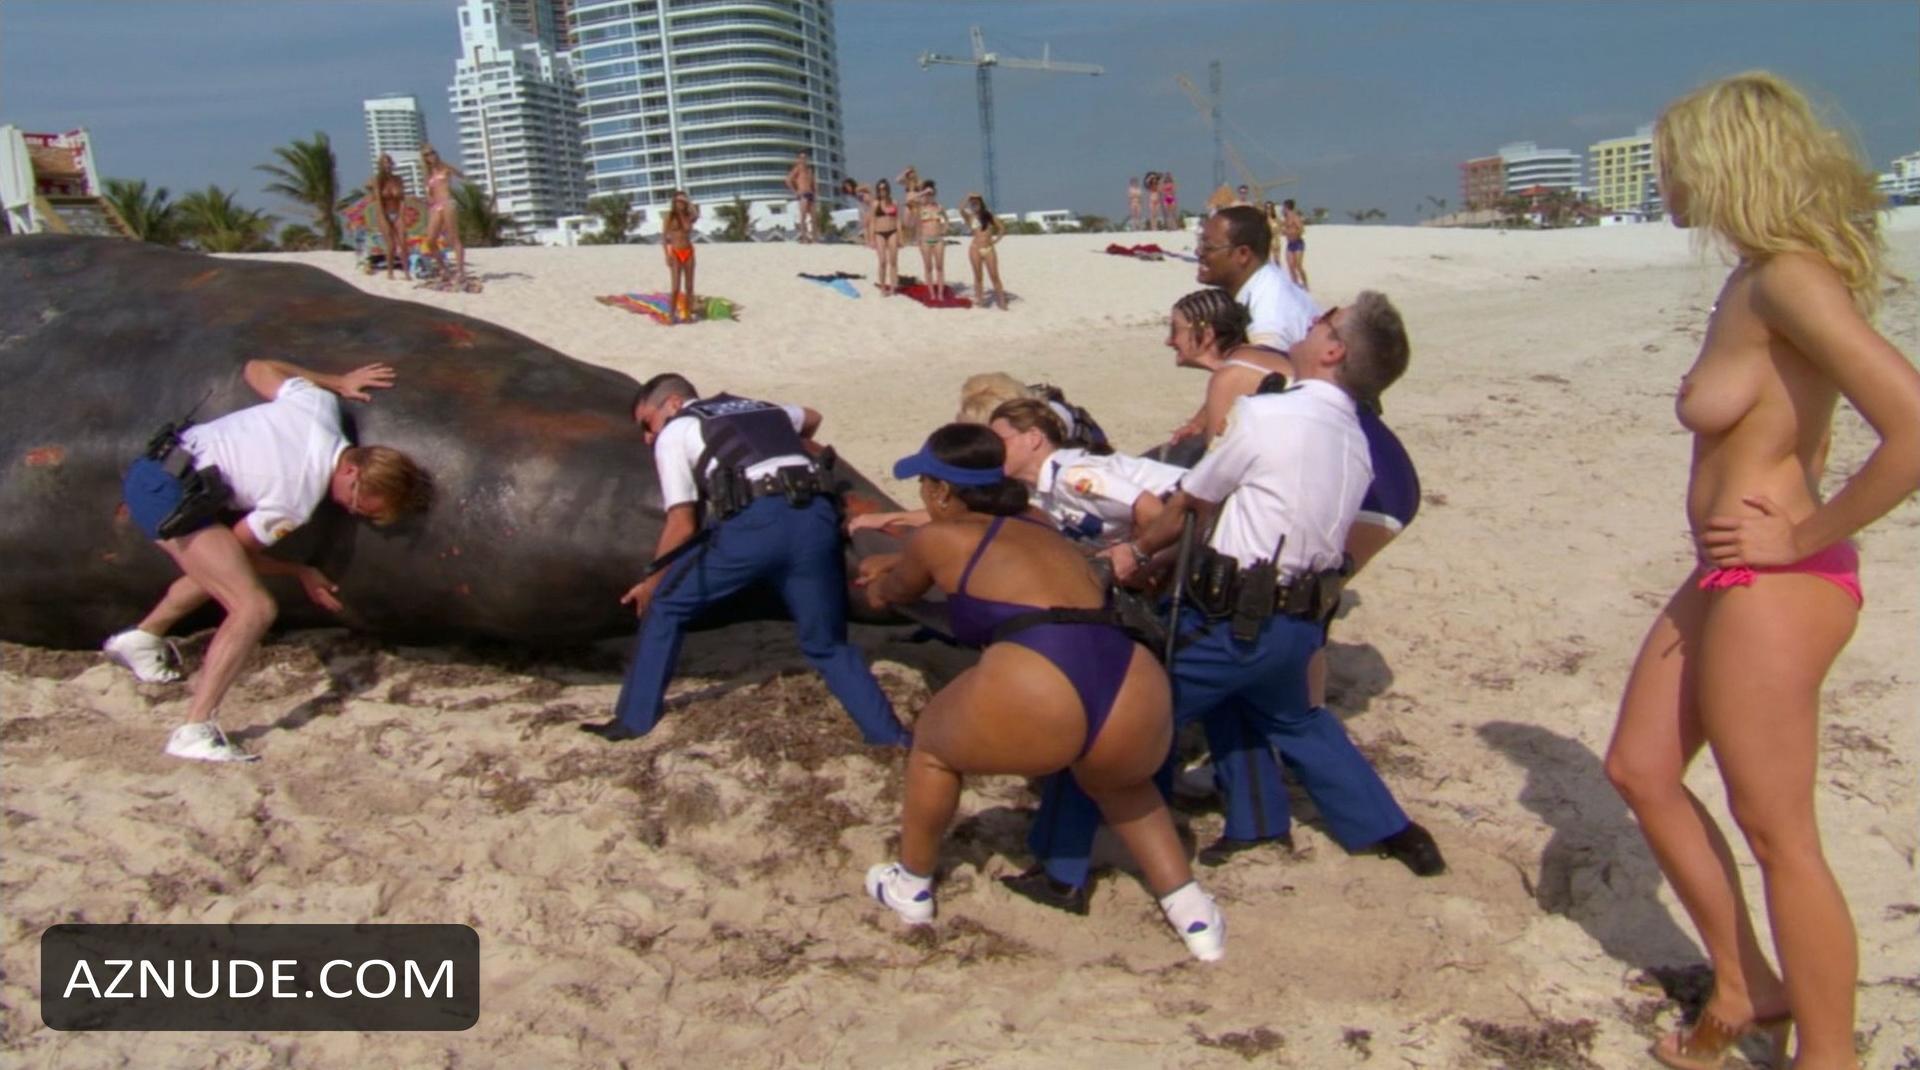 Irina voronina topless reno 911 miami 2007 - 2 part 5